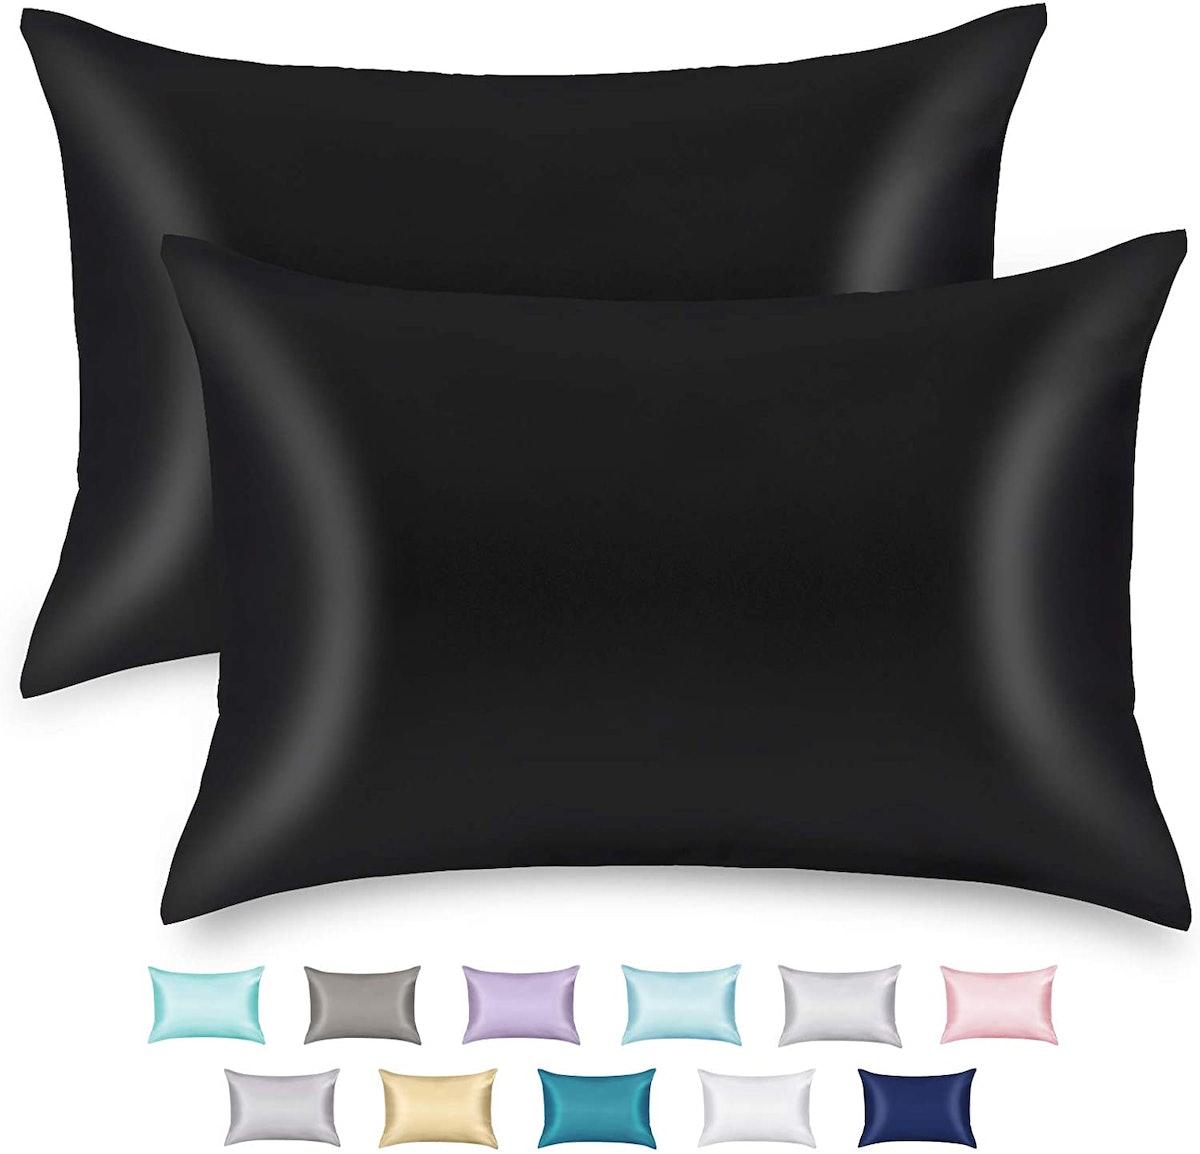 ZAMAT Satin Pillowcases (Set of 2)